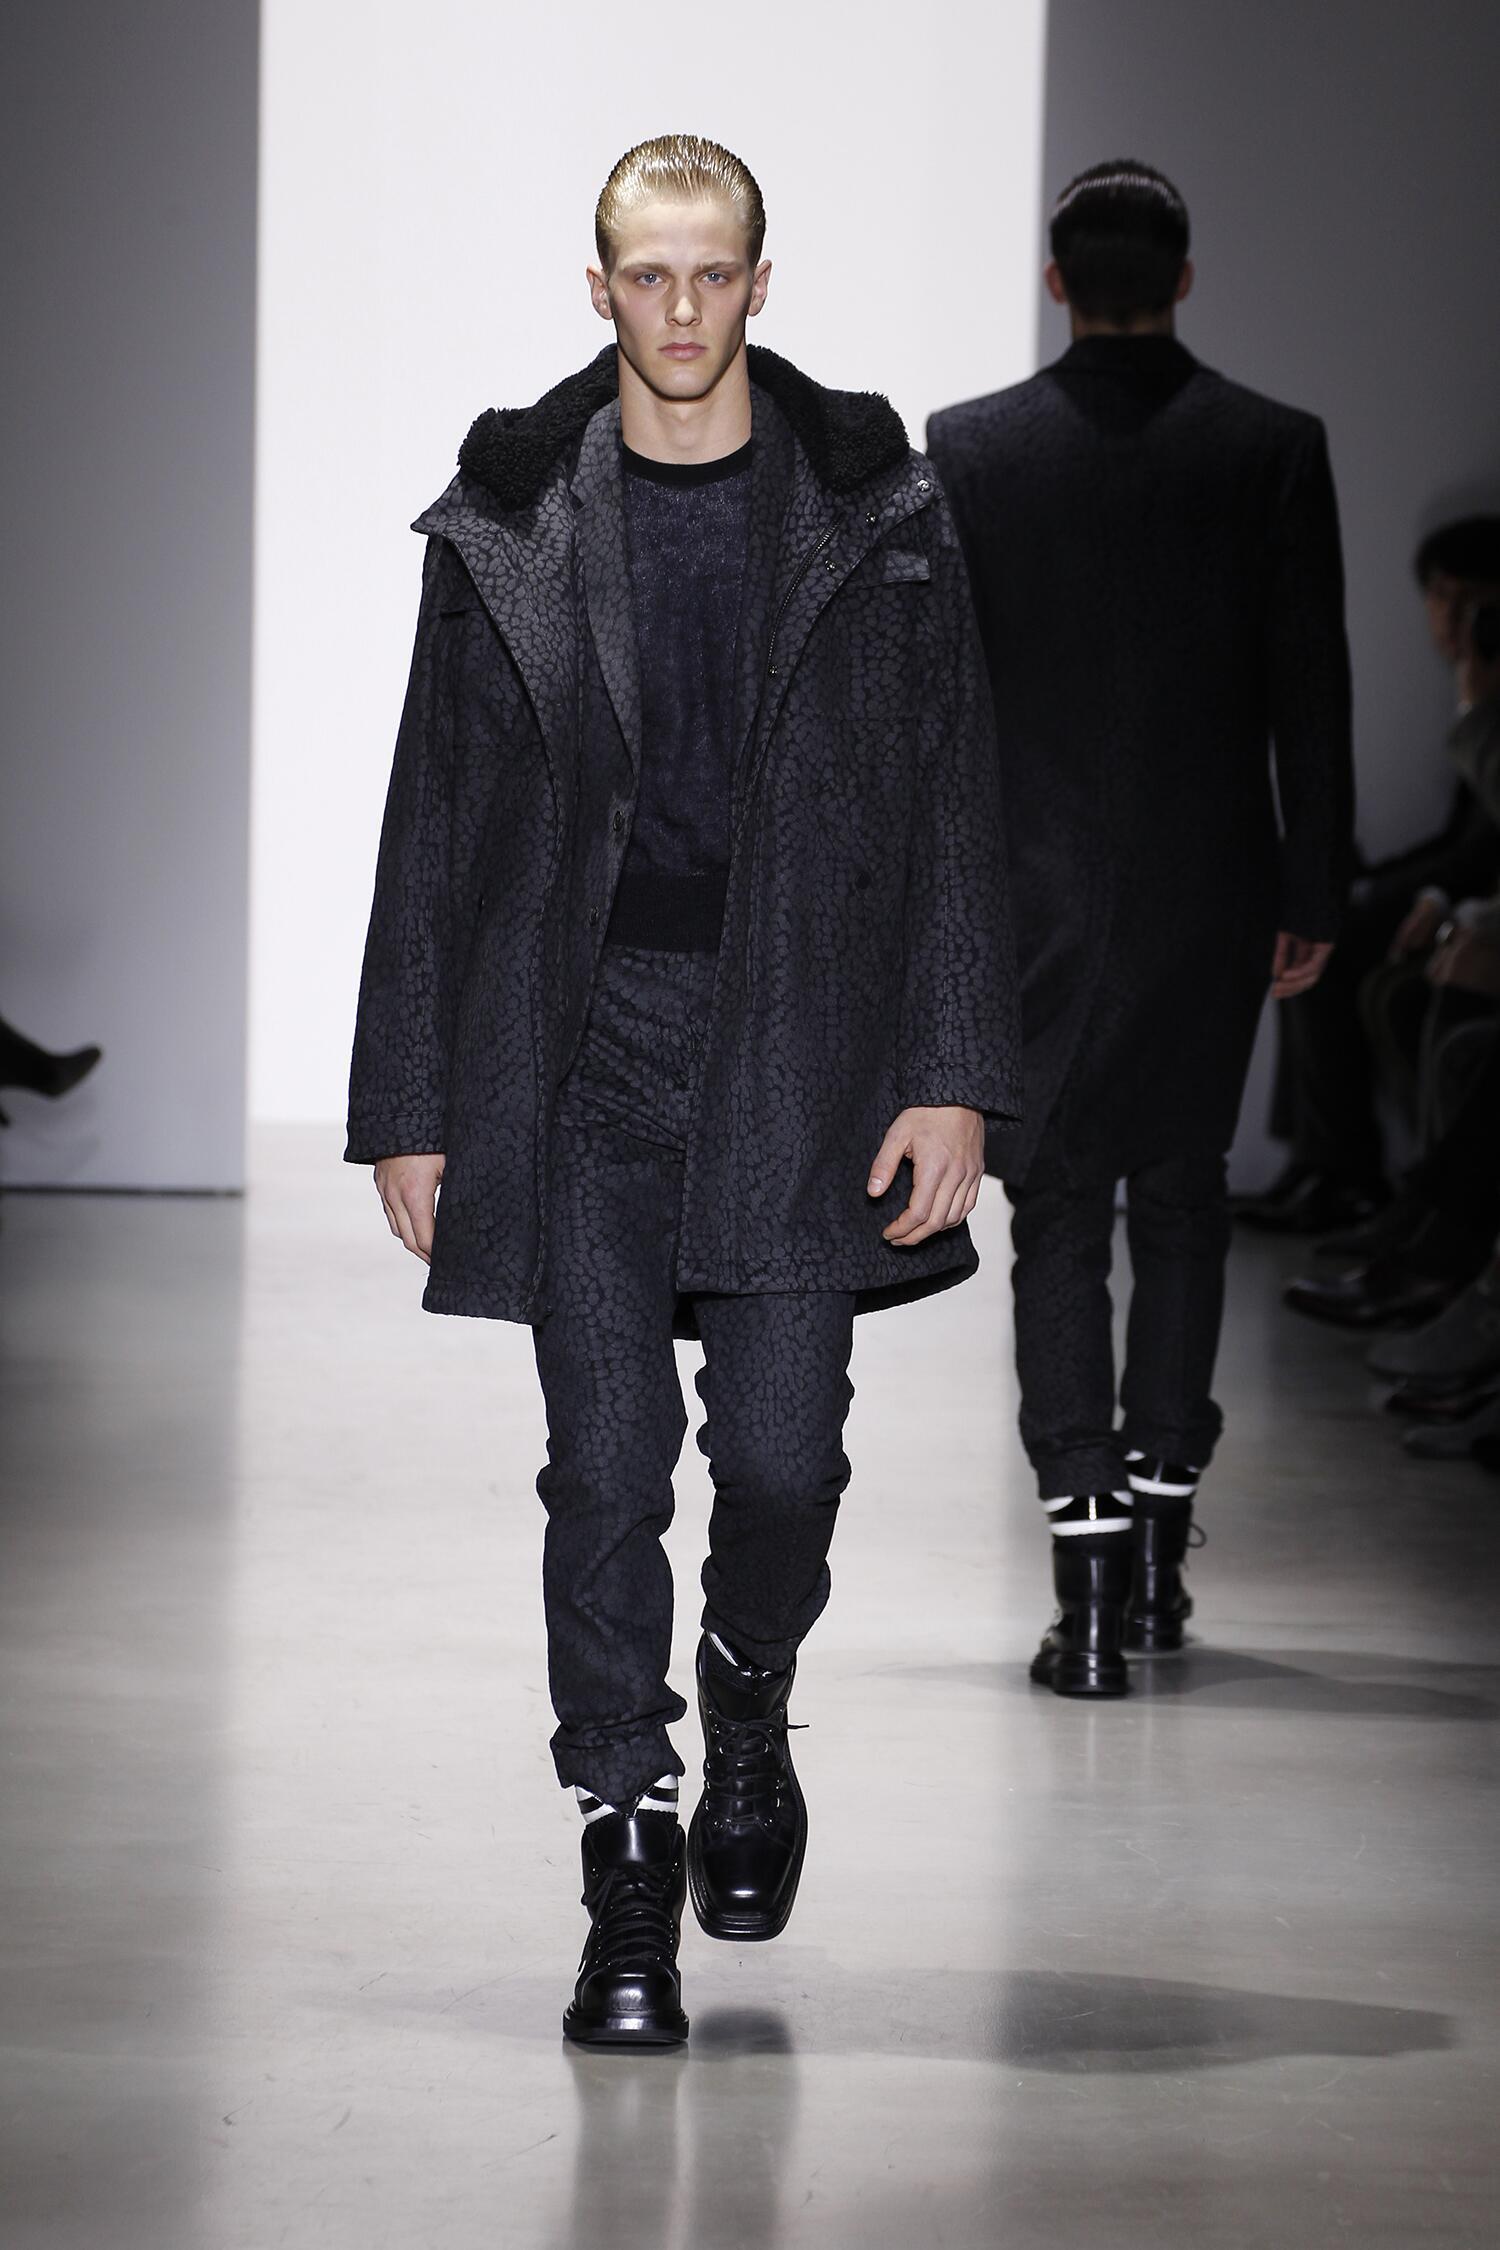 Winter Trends 2015 Man Calvin Klein Collection